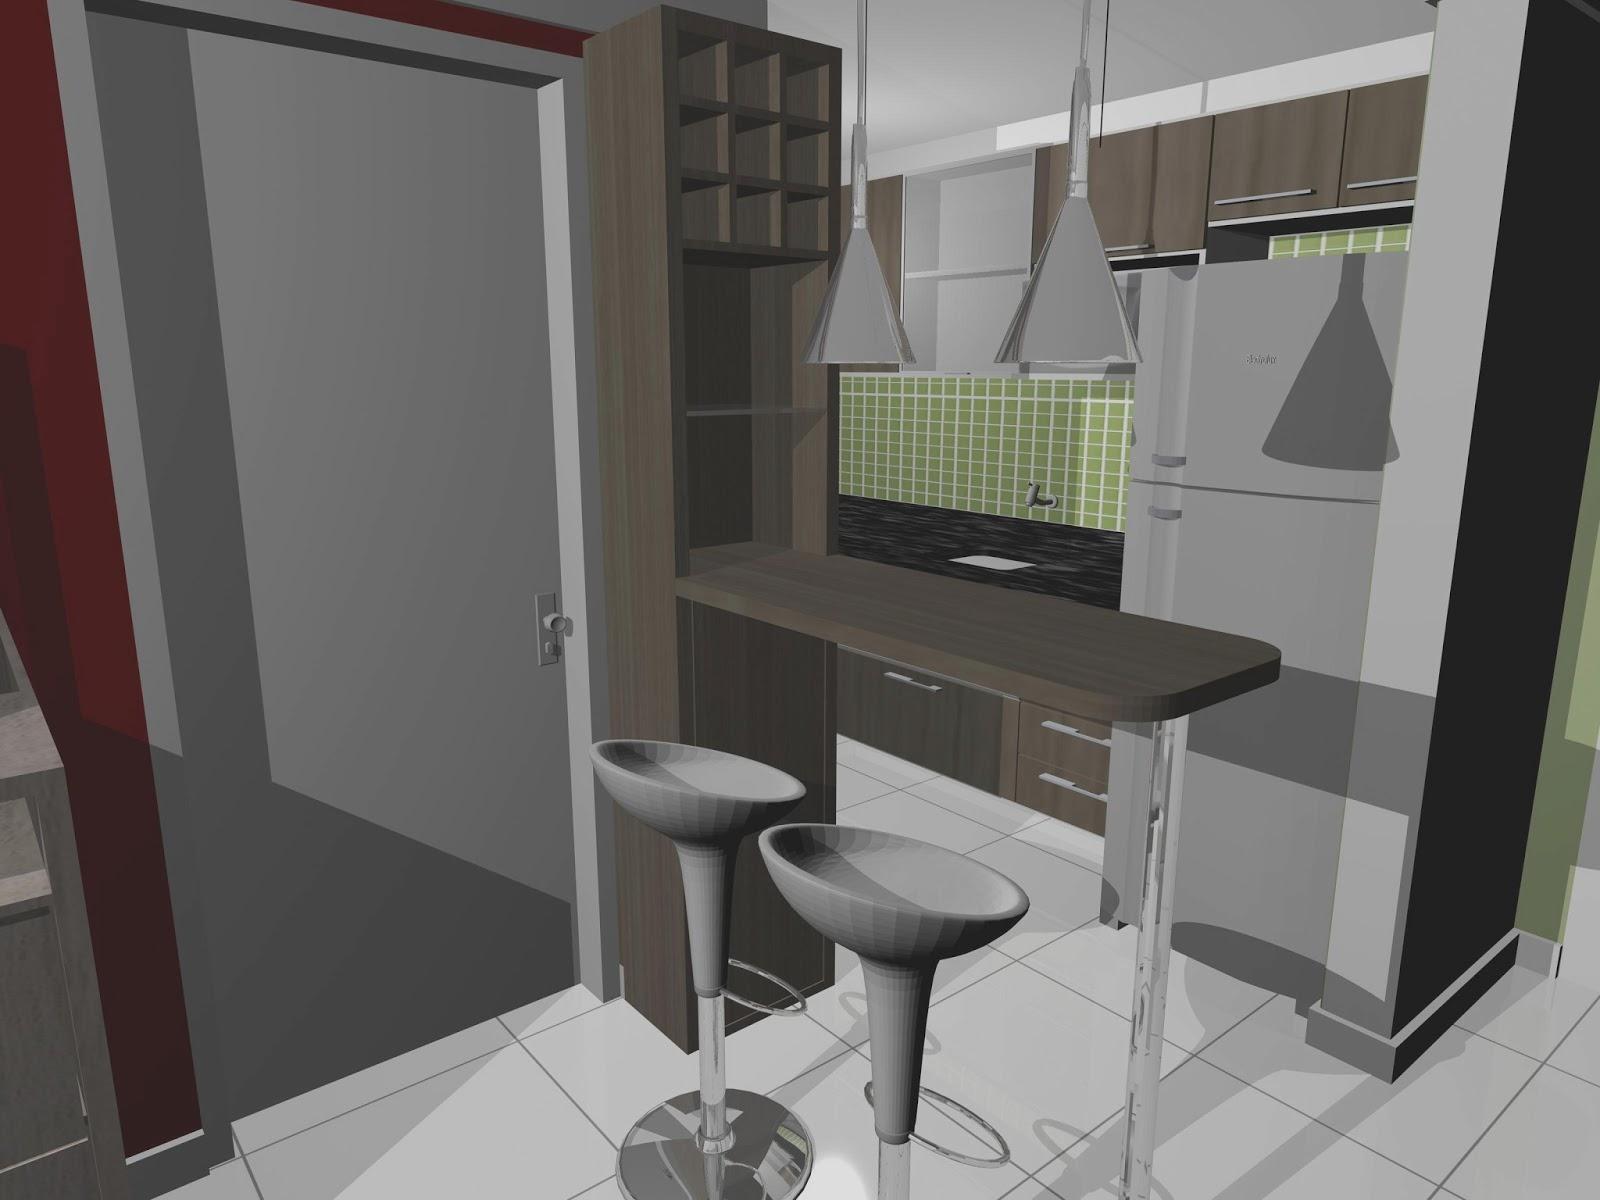 Compacto Essencial: Projeto apartamento compacto para casal e 1  #6C7457 1600 1200